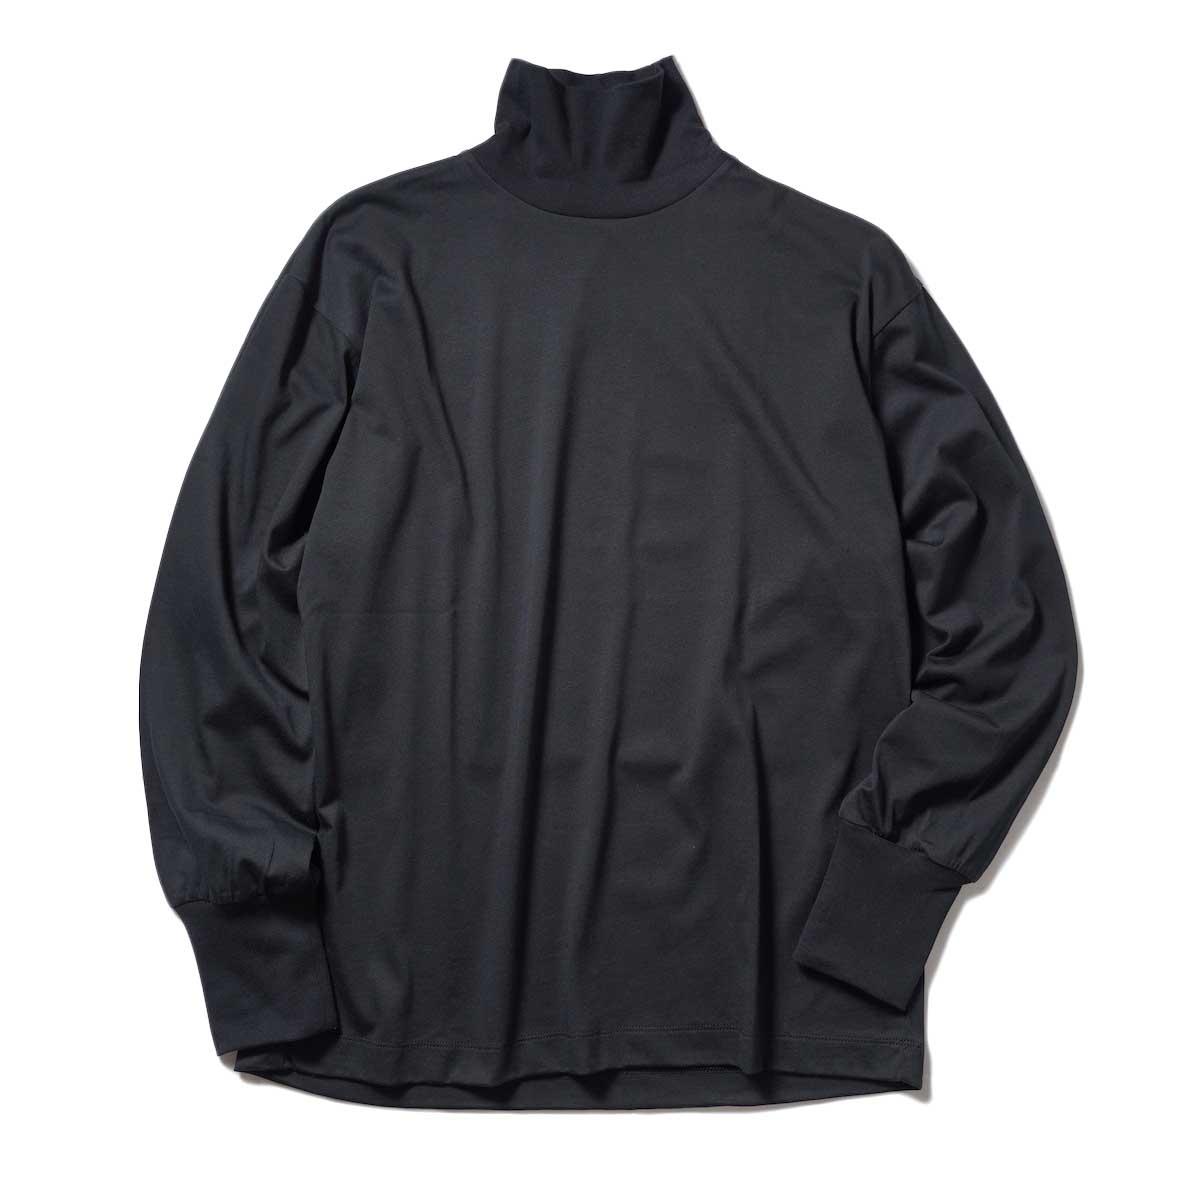 YLEVE / SOFT ORGANIC COTTON TURTLE (Black)